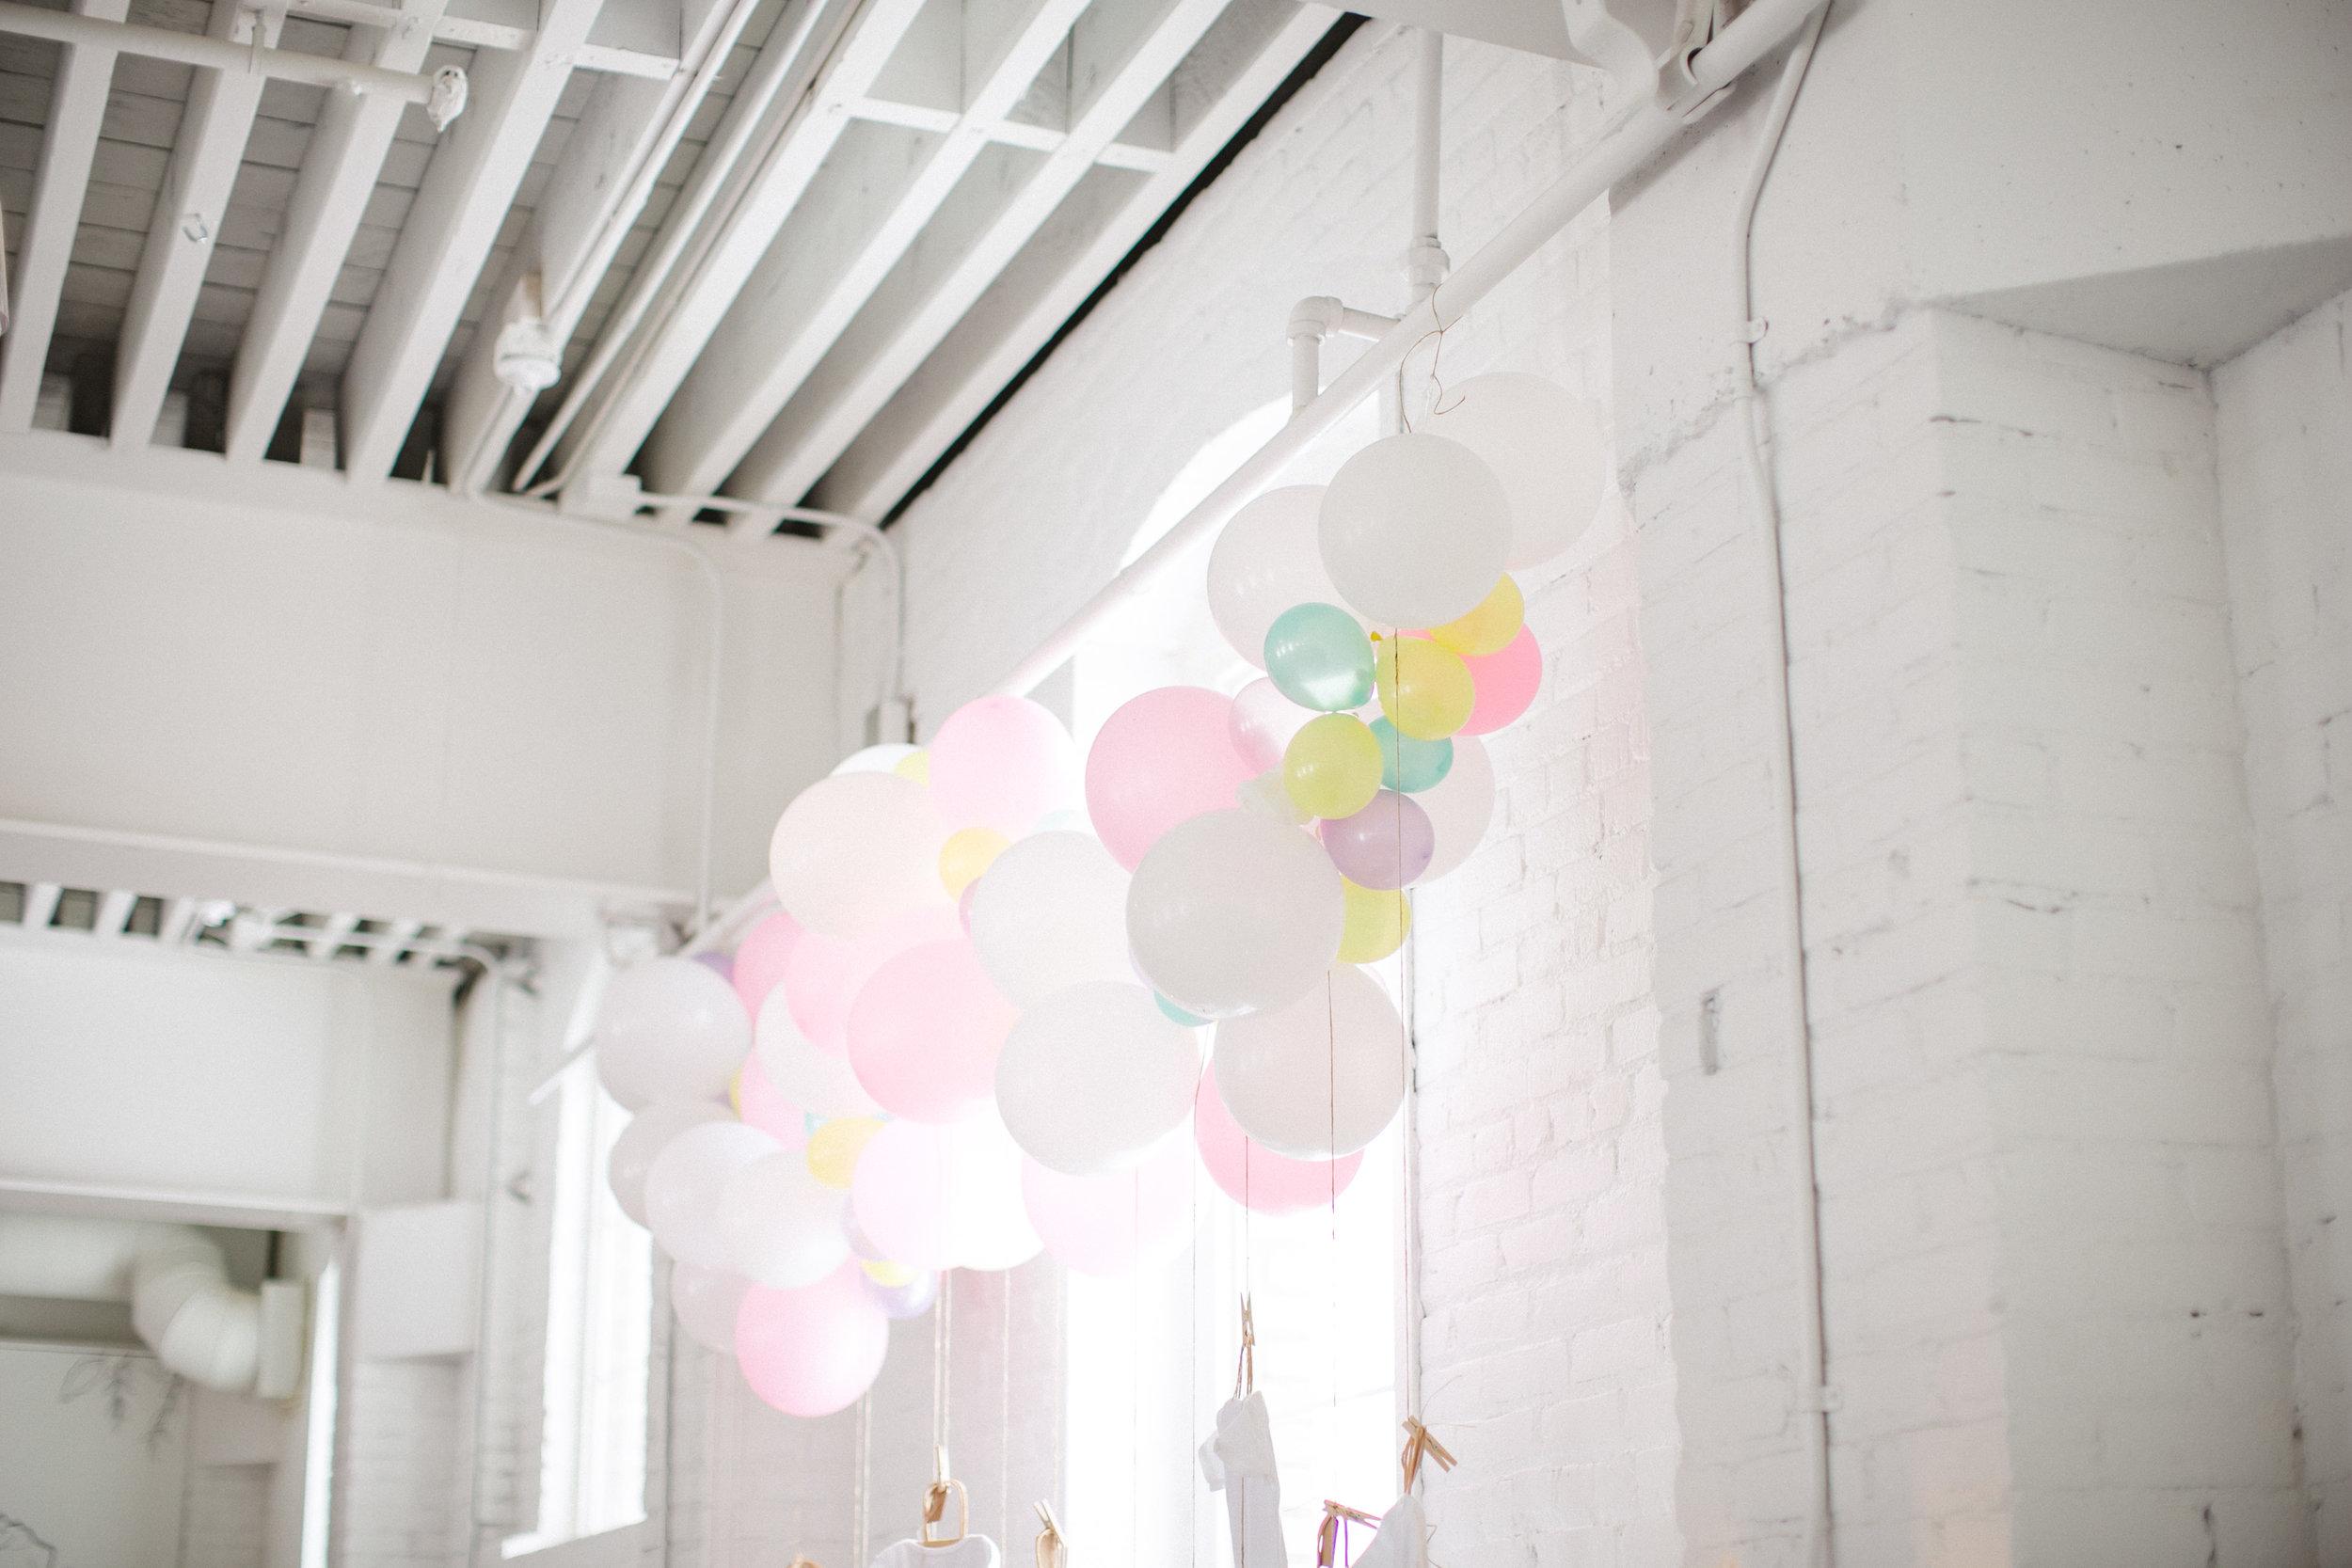 by Aimee Jobe Luminary Fern Brainerd Baby Shower Space-10.jpg